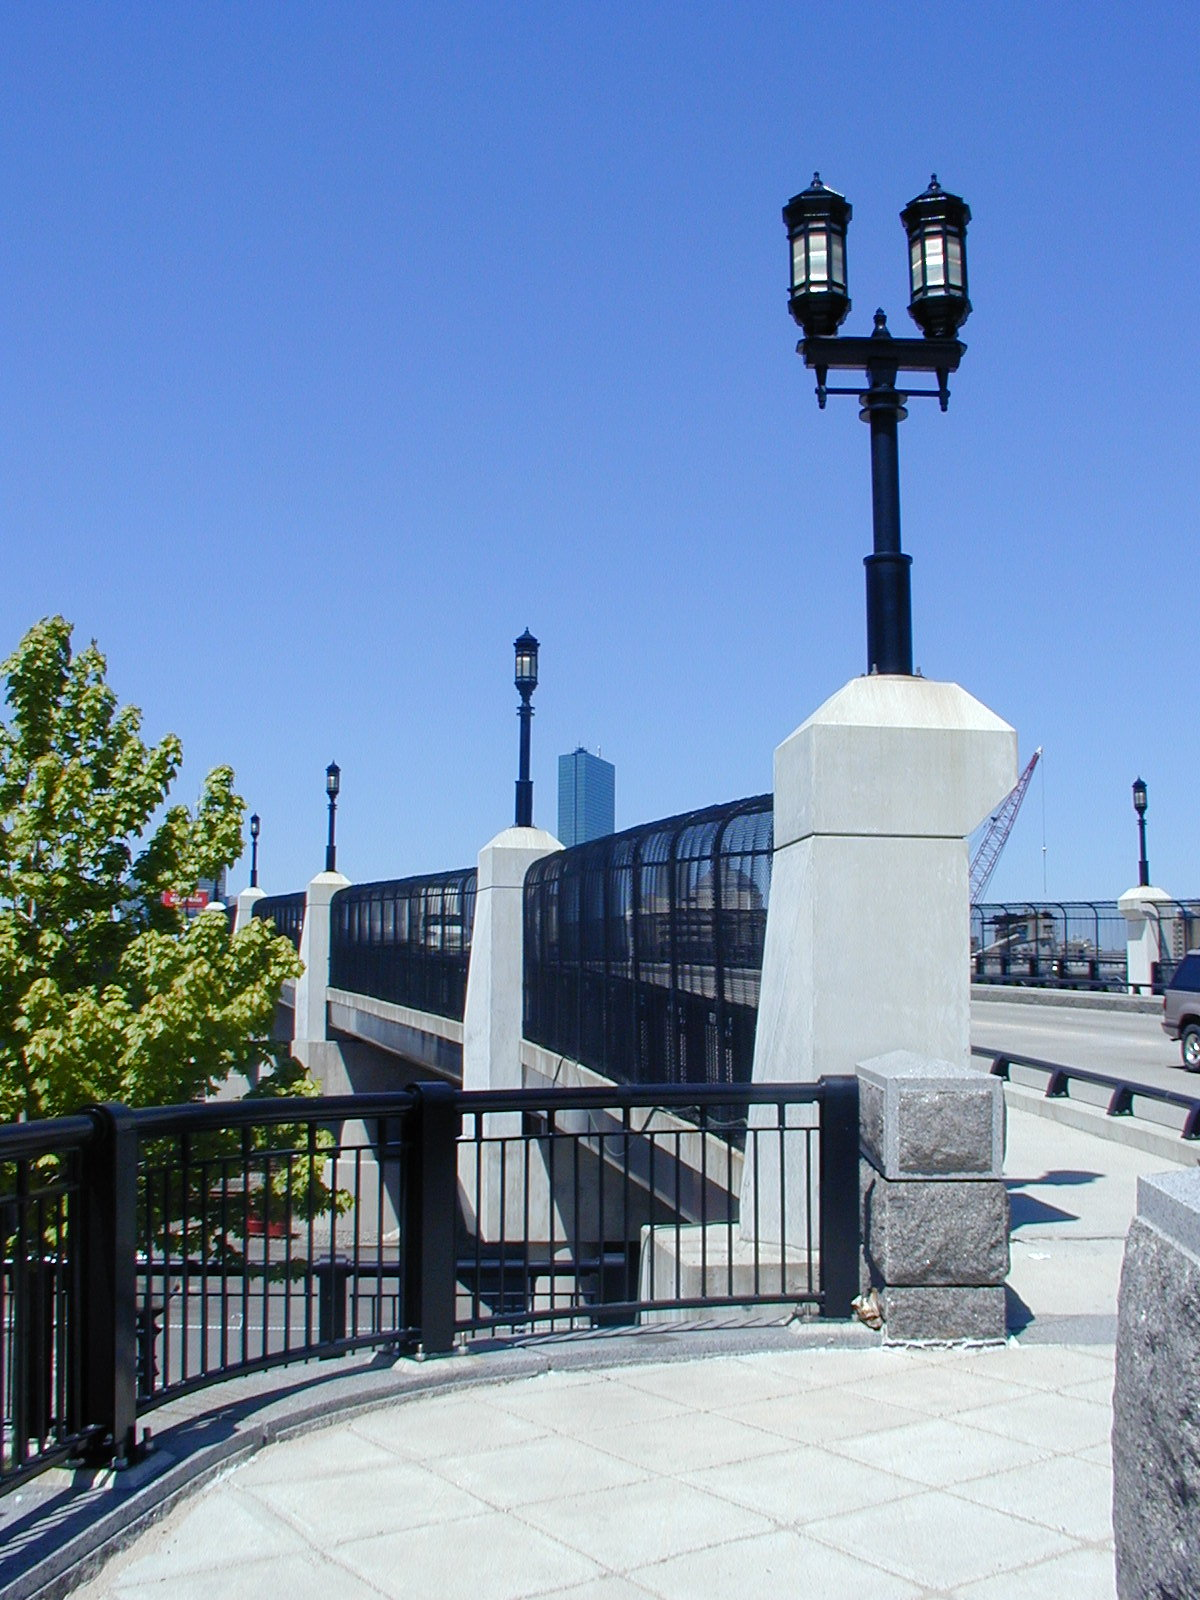 Broadway Street Bridge Boston, MA